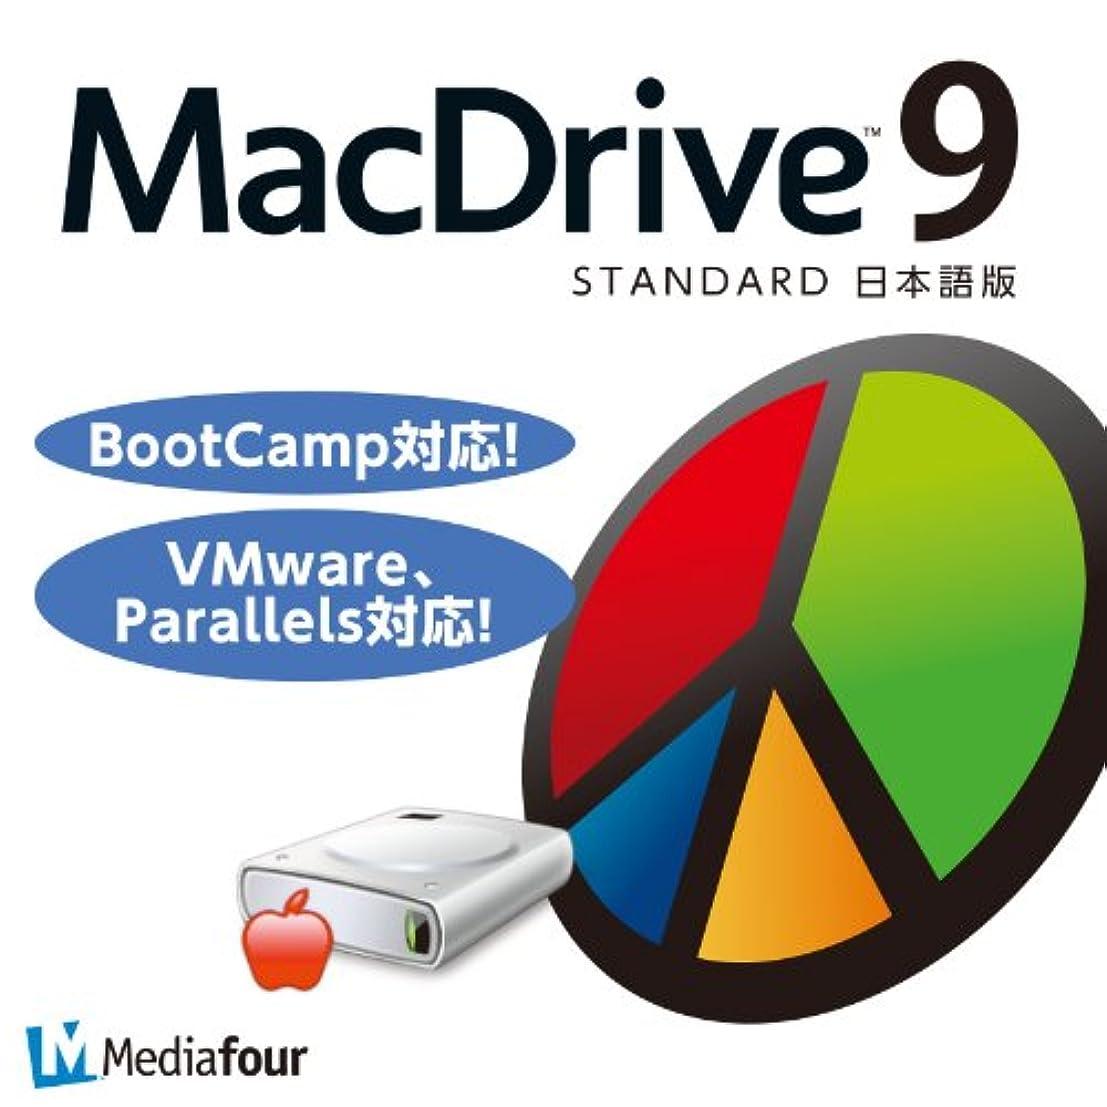 MacDrive 9 Standard 日本語版 5ライセンスパック ダウンロード [ダウンロード]